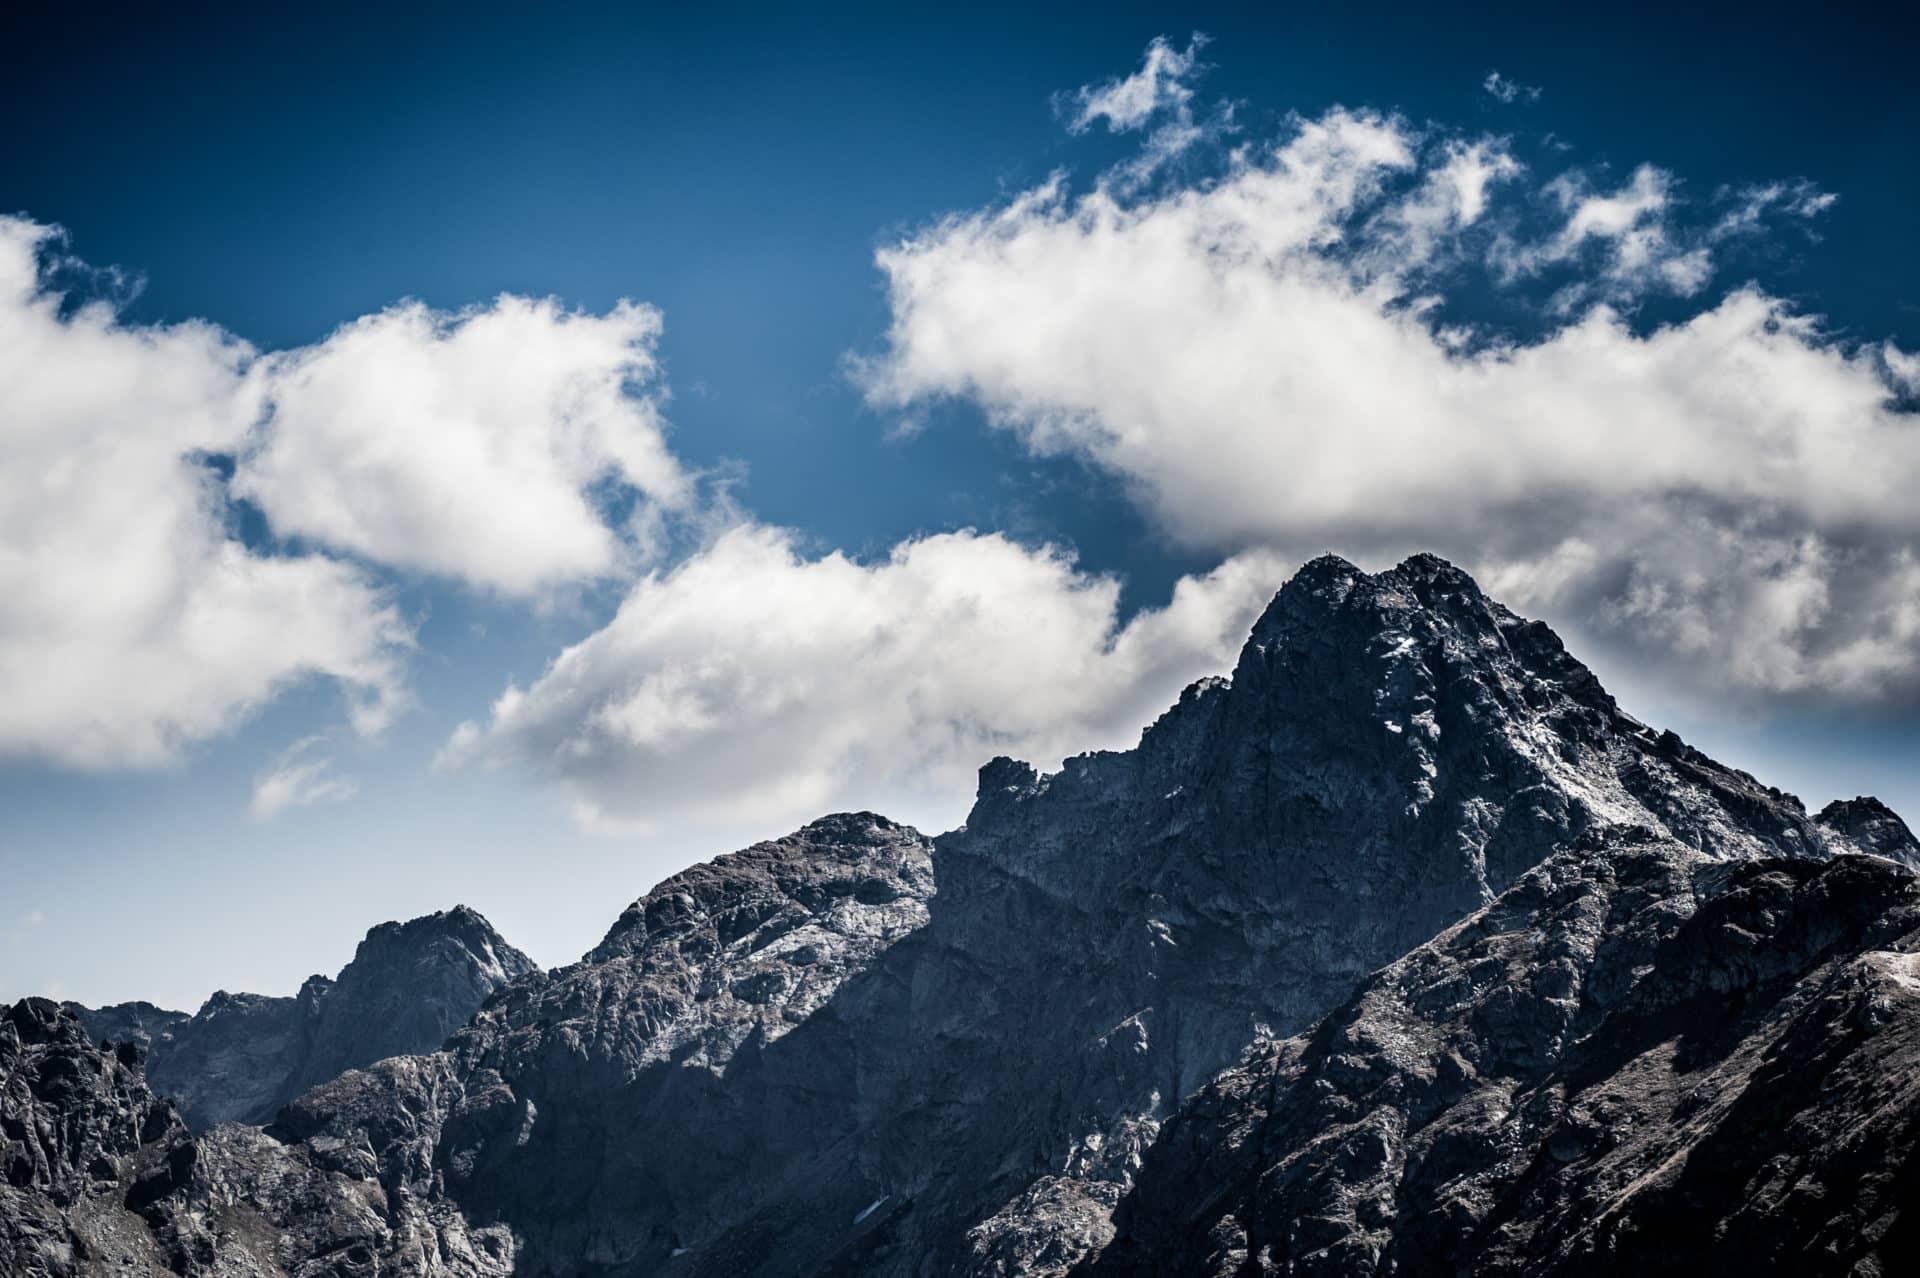 Gerlachovsky mountain, Slovakia, Guided Ascent